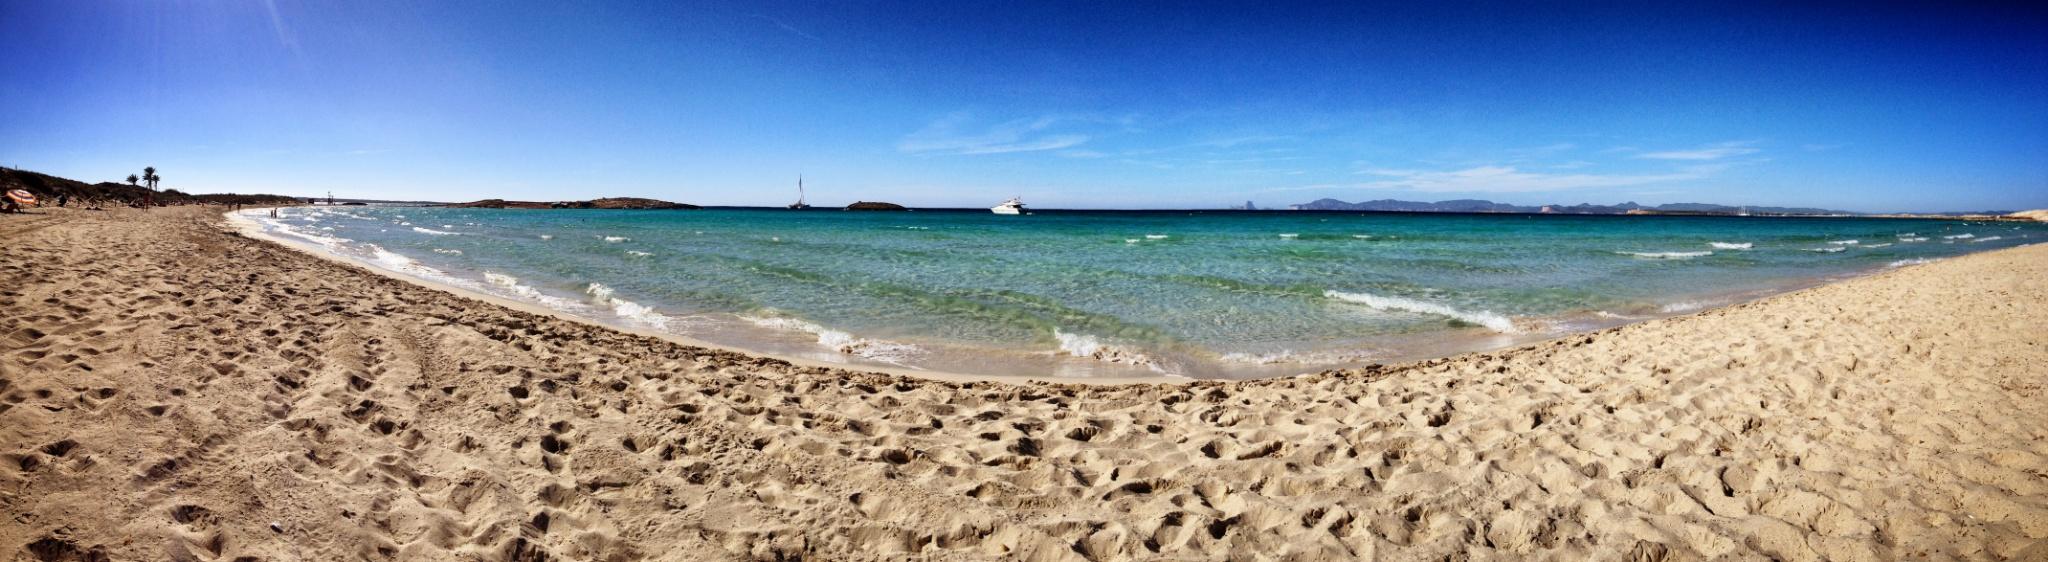 Pano Formentera